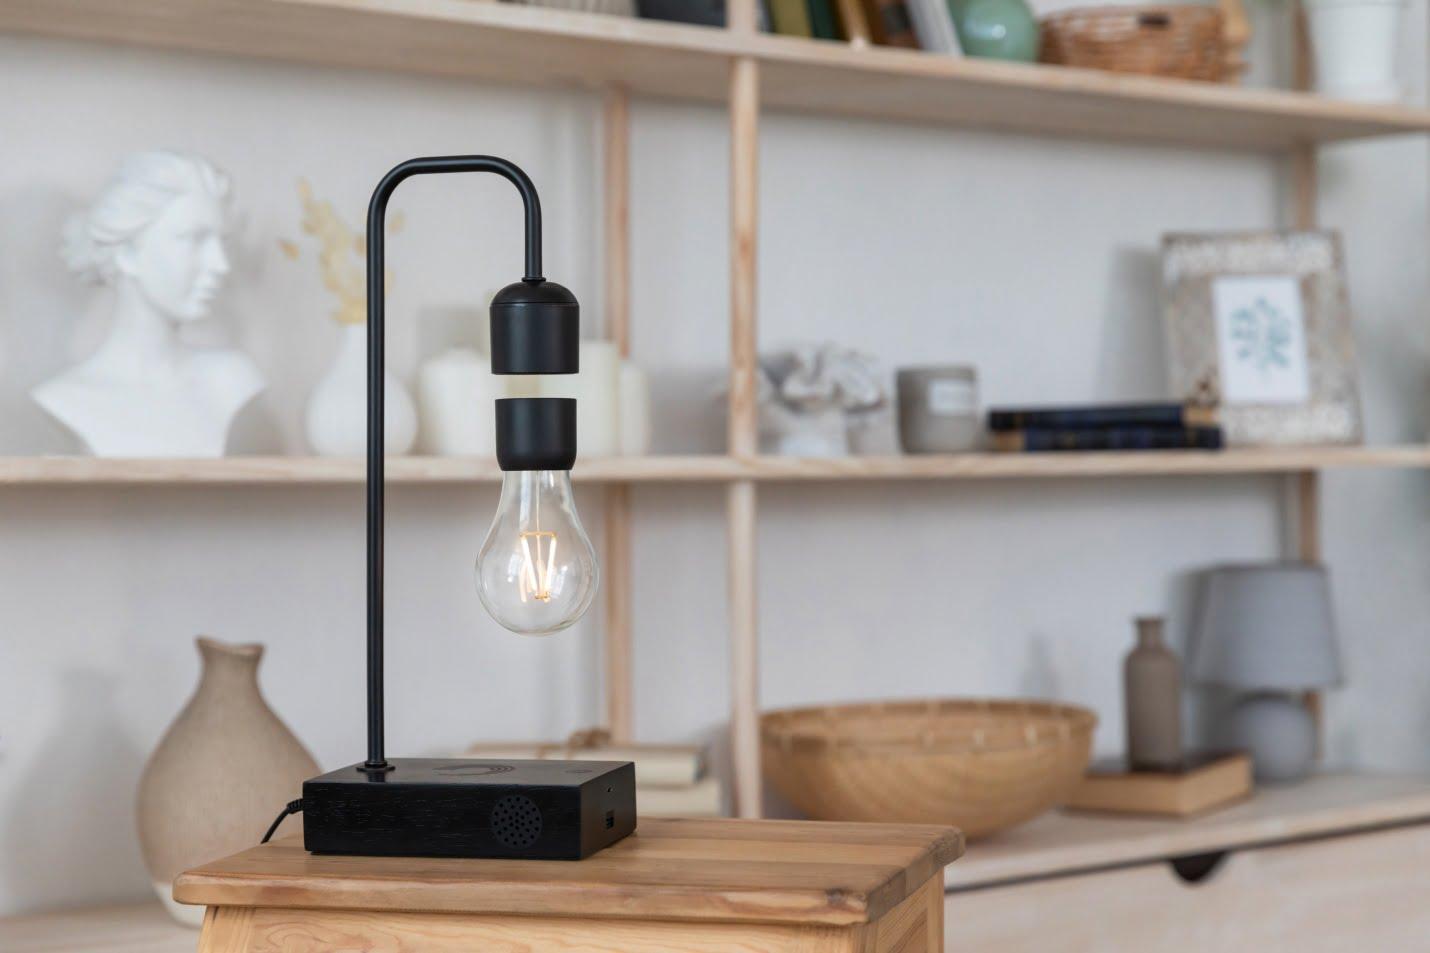 An image of Gravita lamp